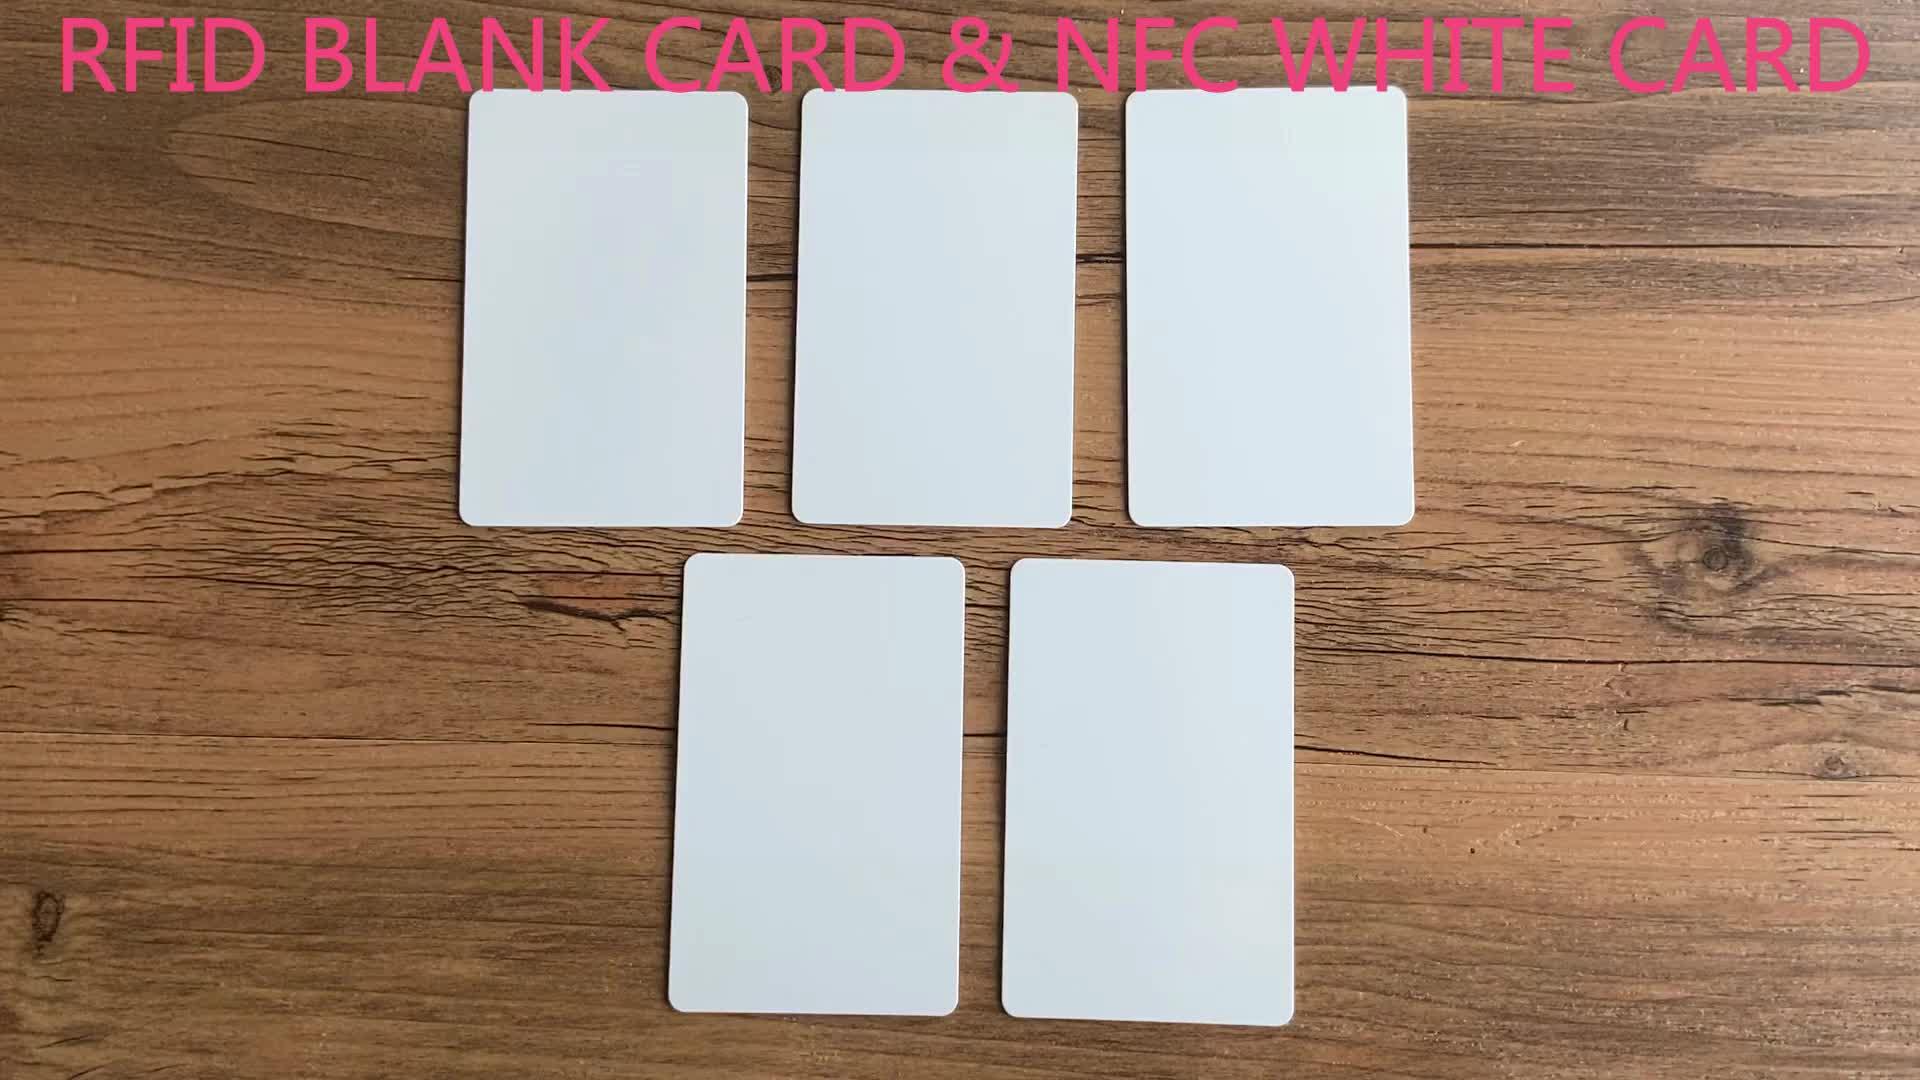 Lage Kosten Alle NFC Mobiele Telefoon en Apparaten Beschrijfbare Afdrukken RFID Wit PVC Lege NFC Kaarten/NFC Id-kaart